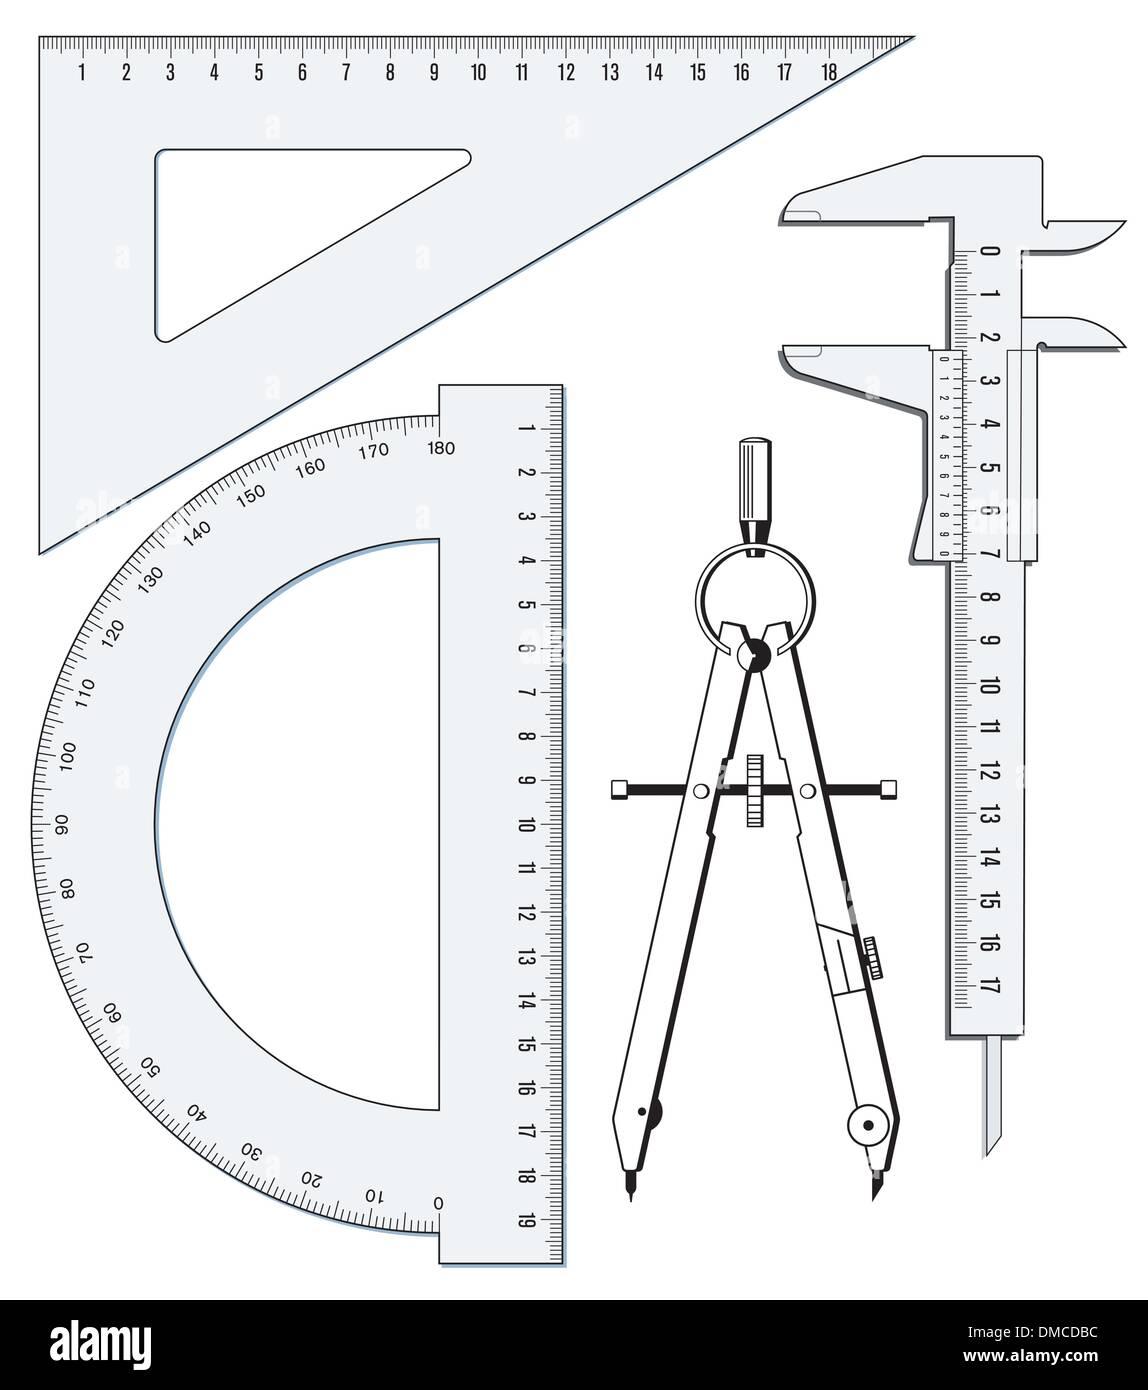 precision geometry - Stock Image